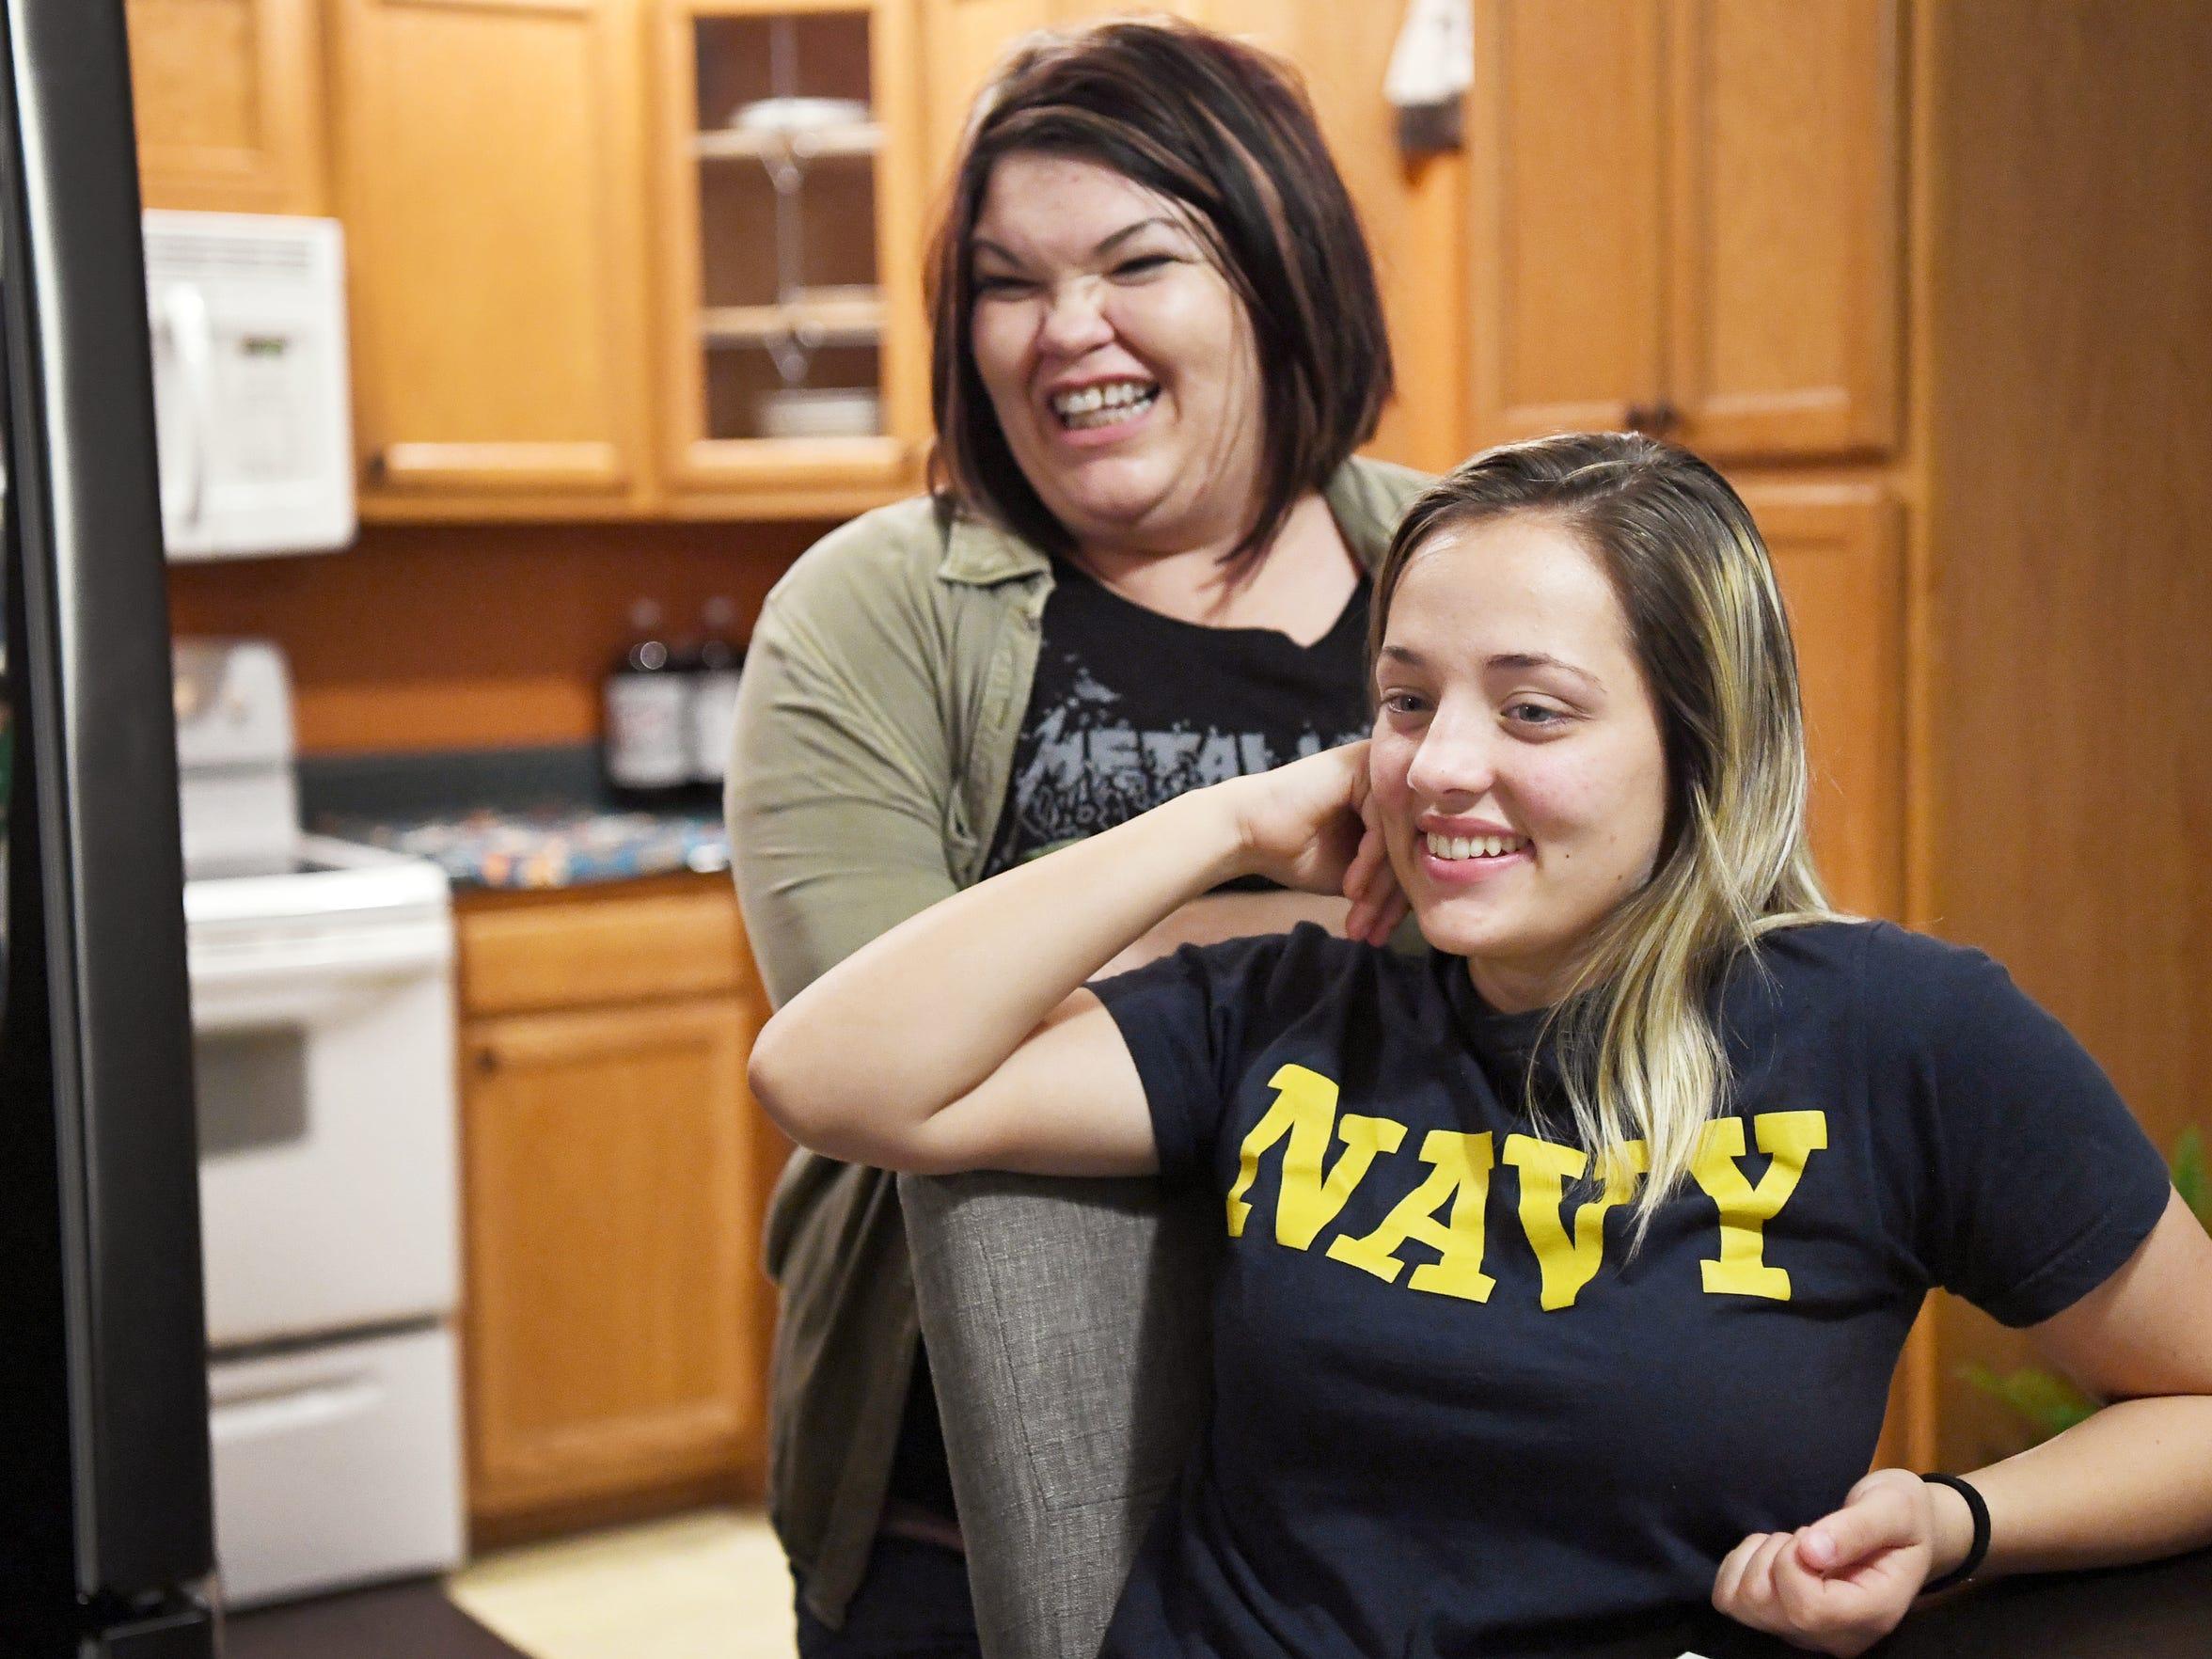 Shantel Wyatt and Mariah talk with Wyatt's daughter,